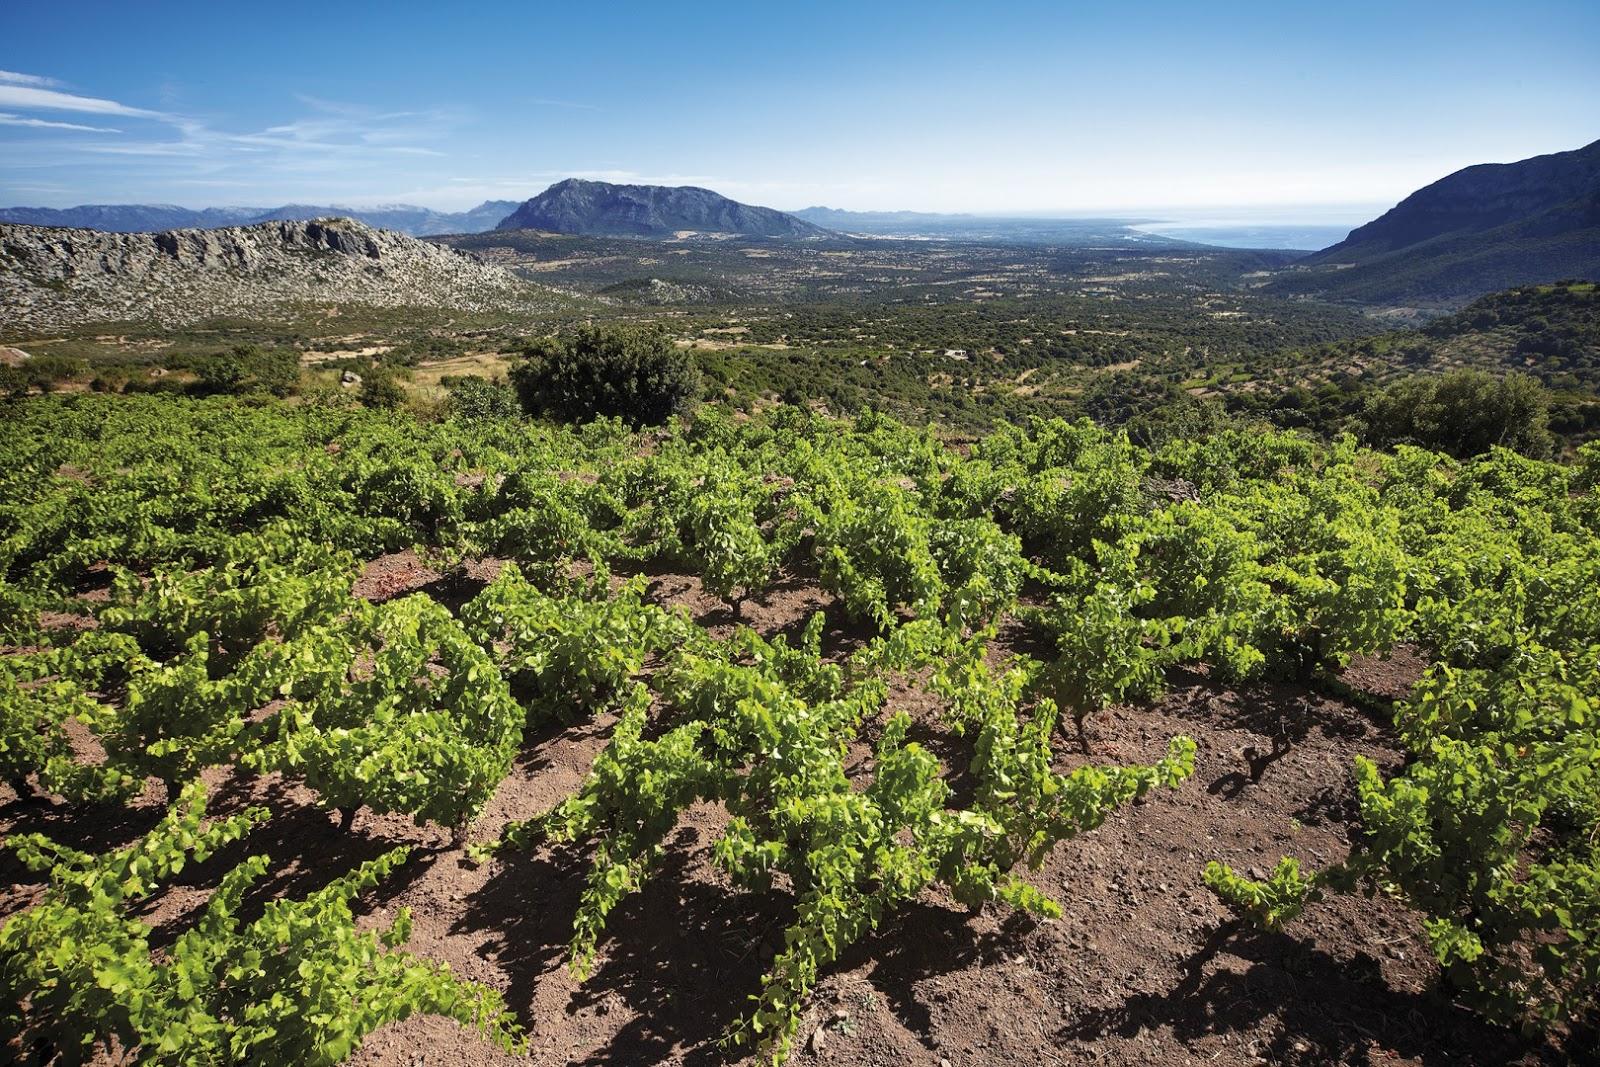 Binu malu e pani tostau durant de prus: La viticoltura in Sardegna